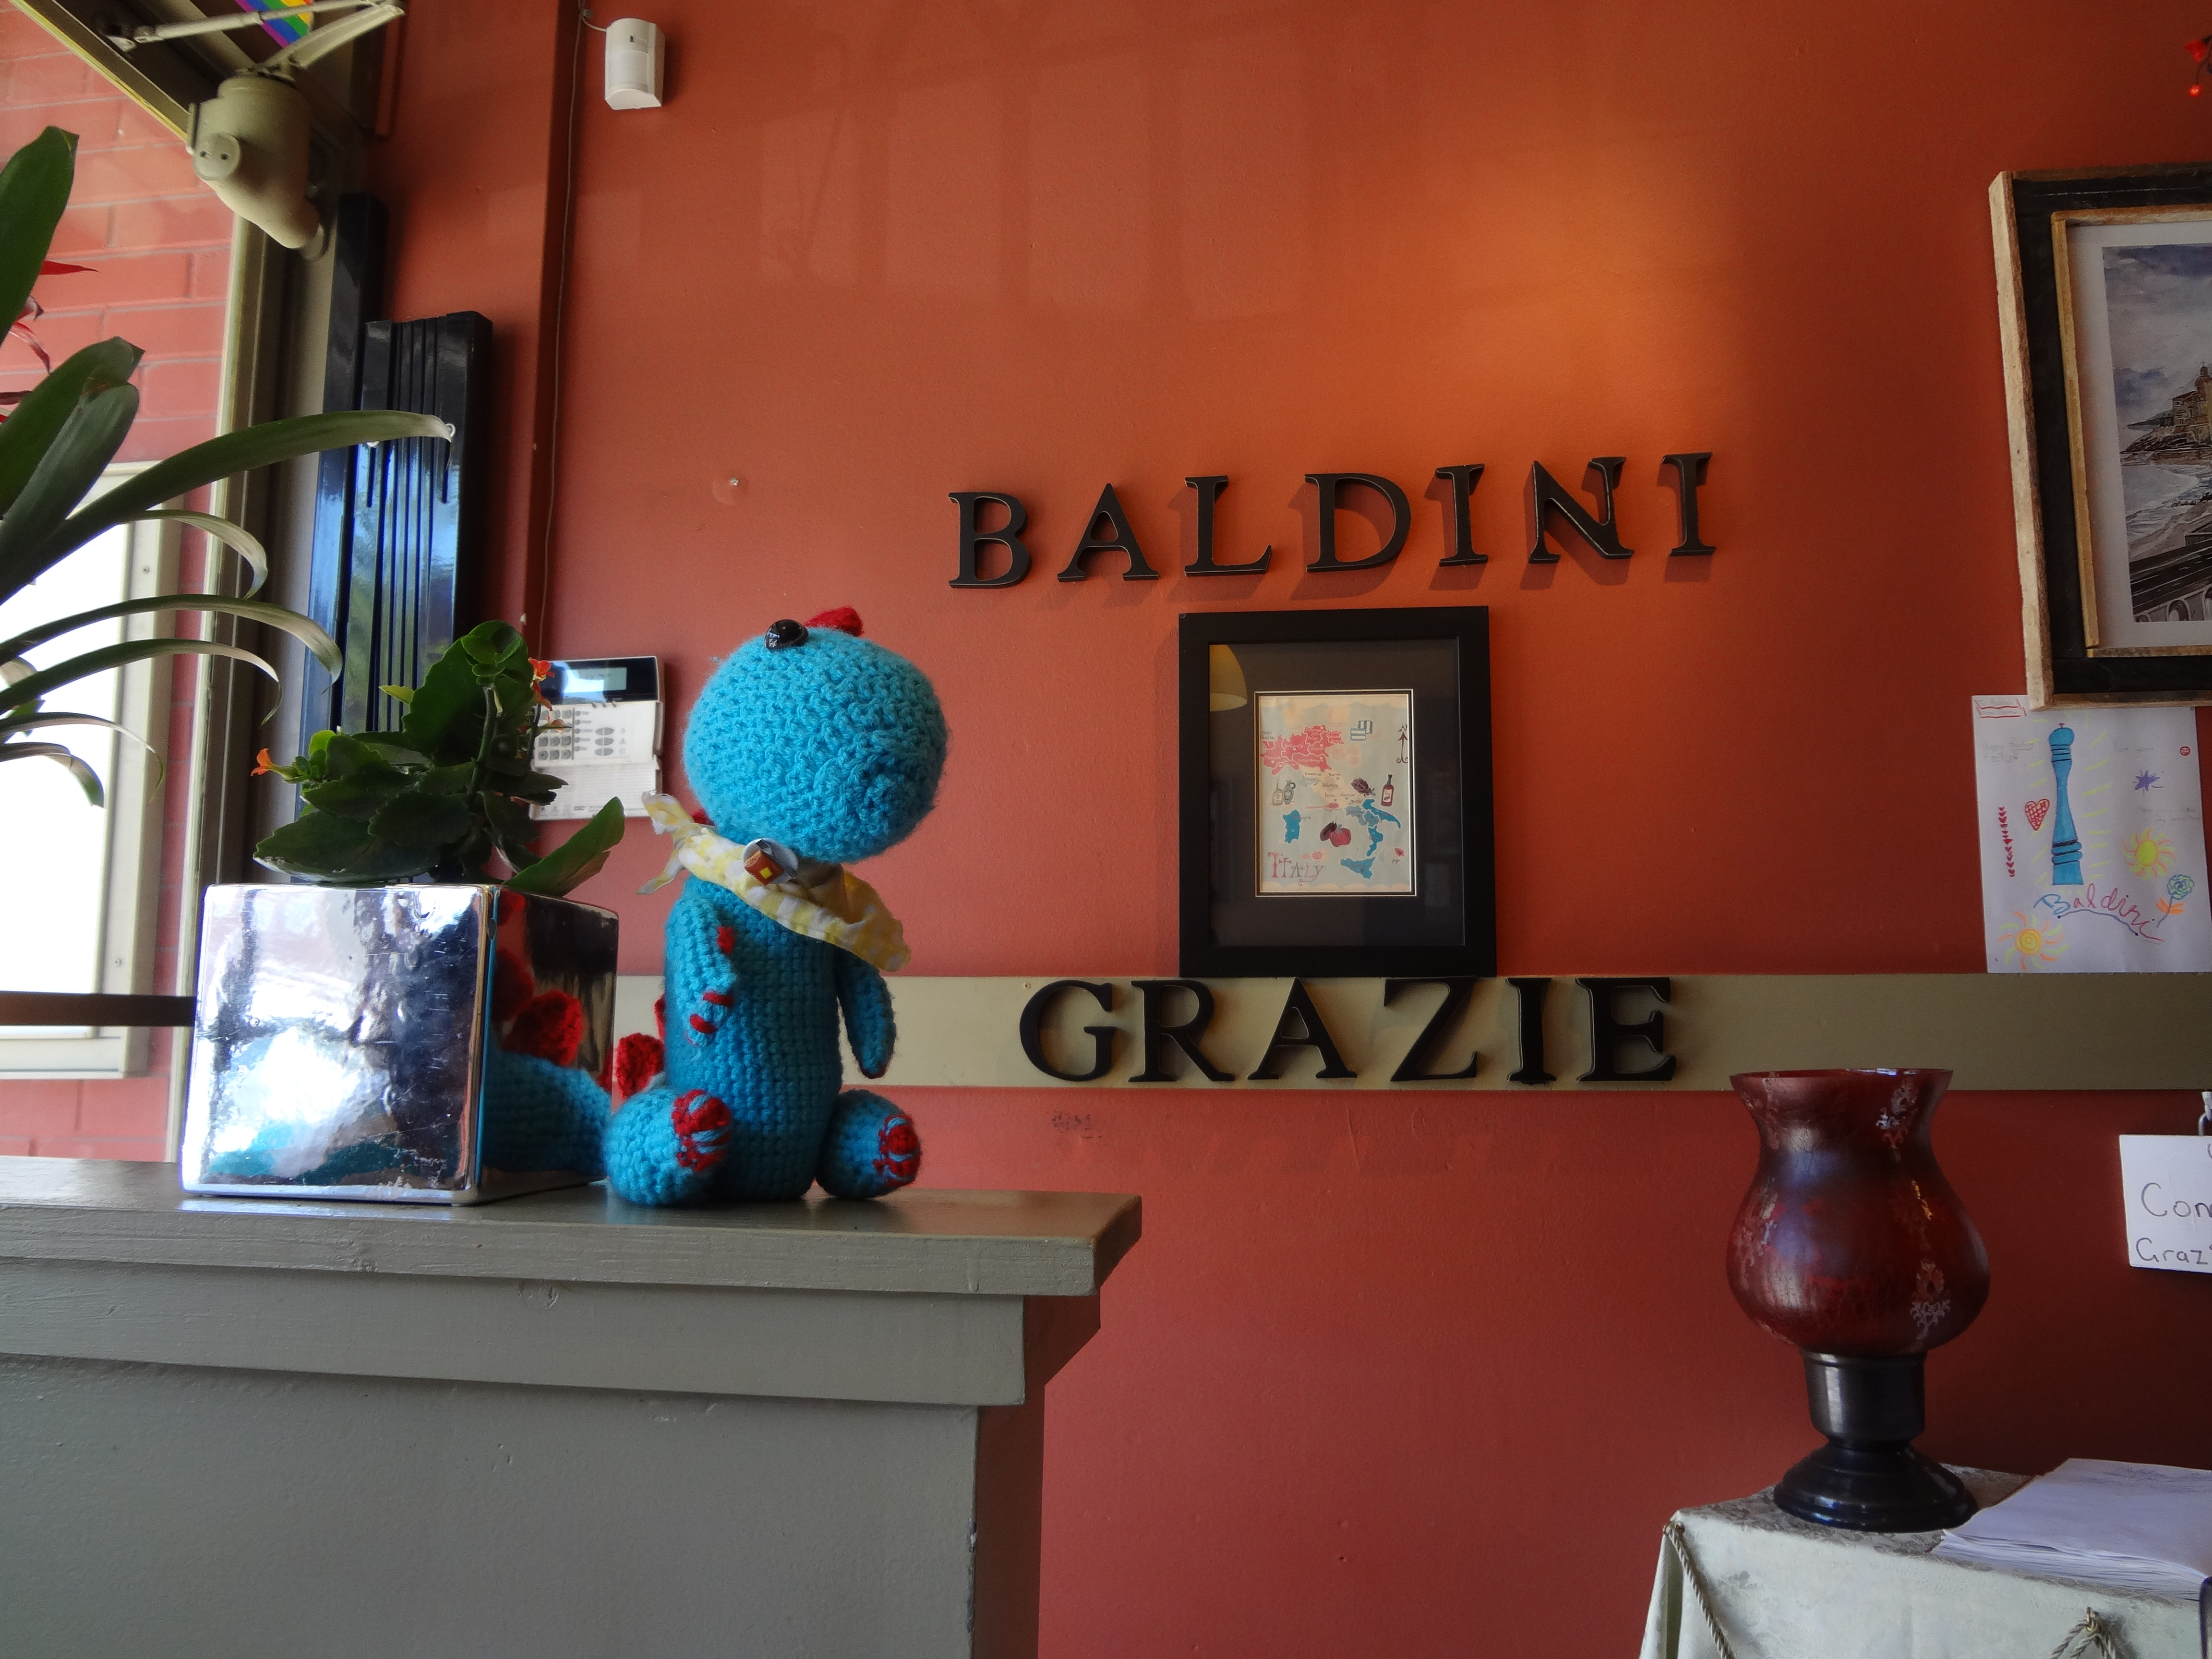 Baldini's Restaurant